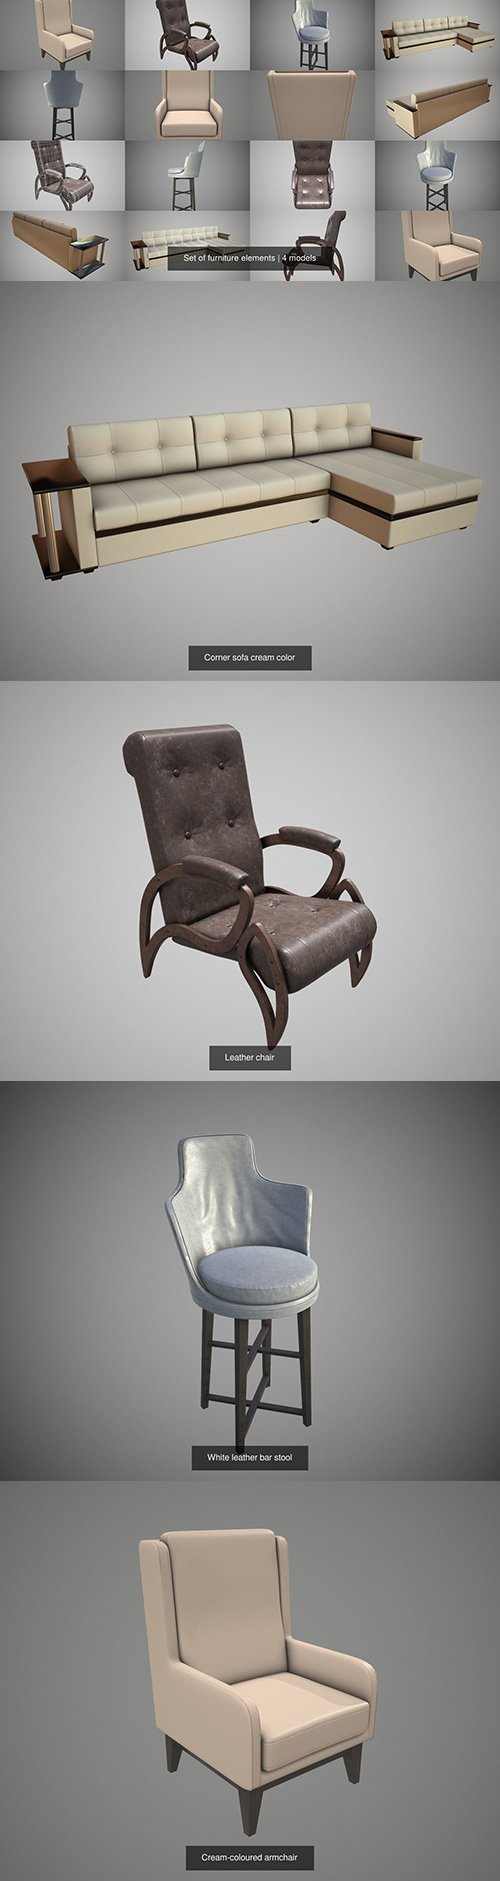 Set of furniture elements 3D Model Collection